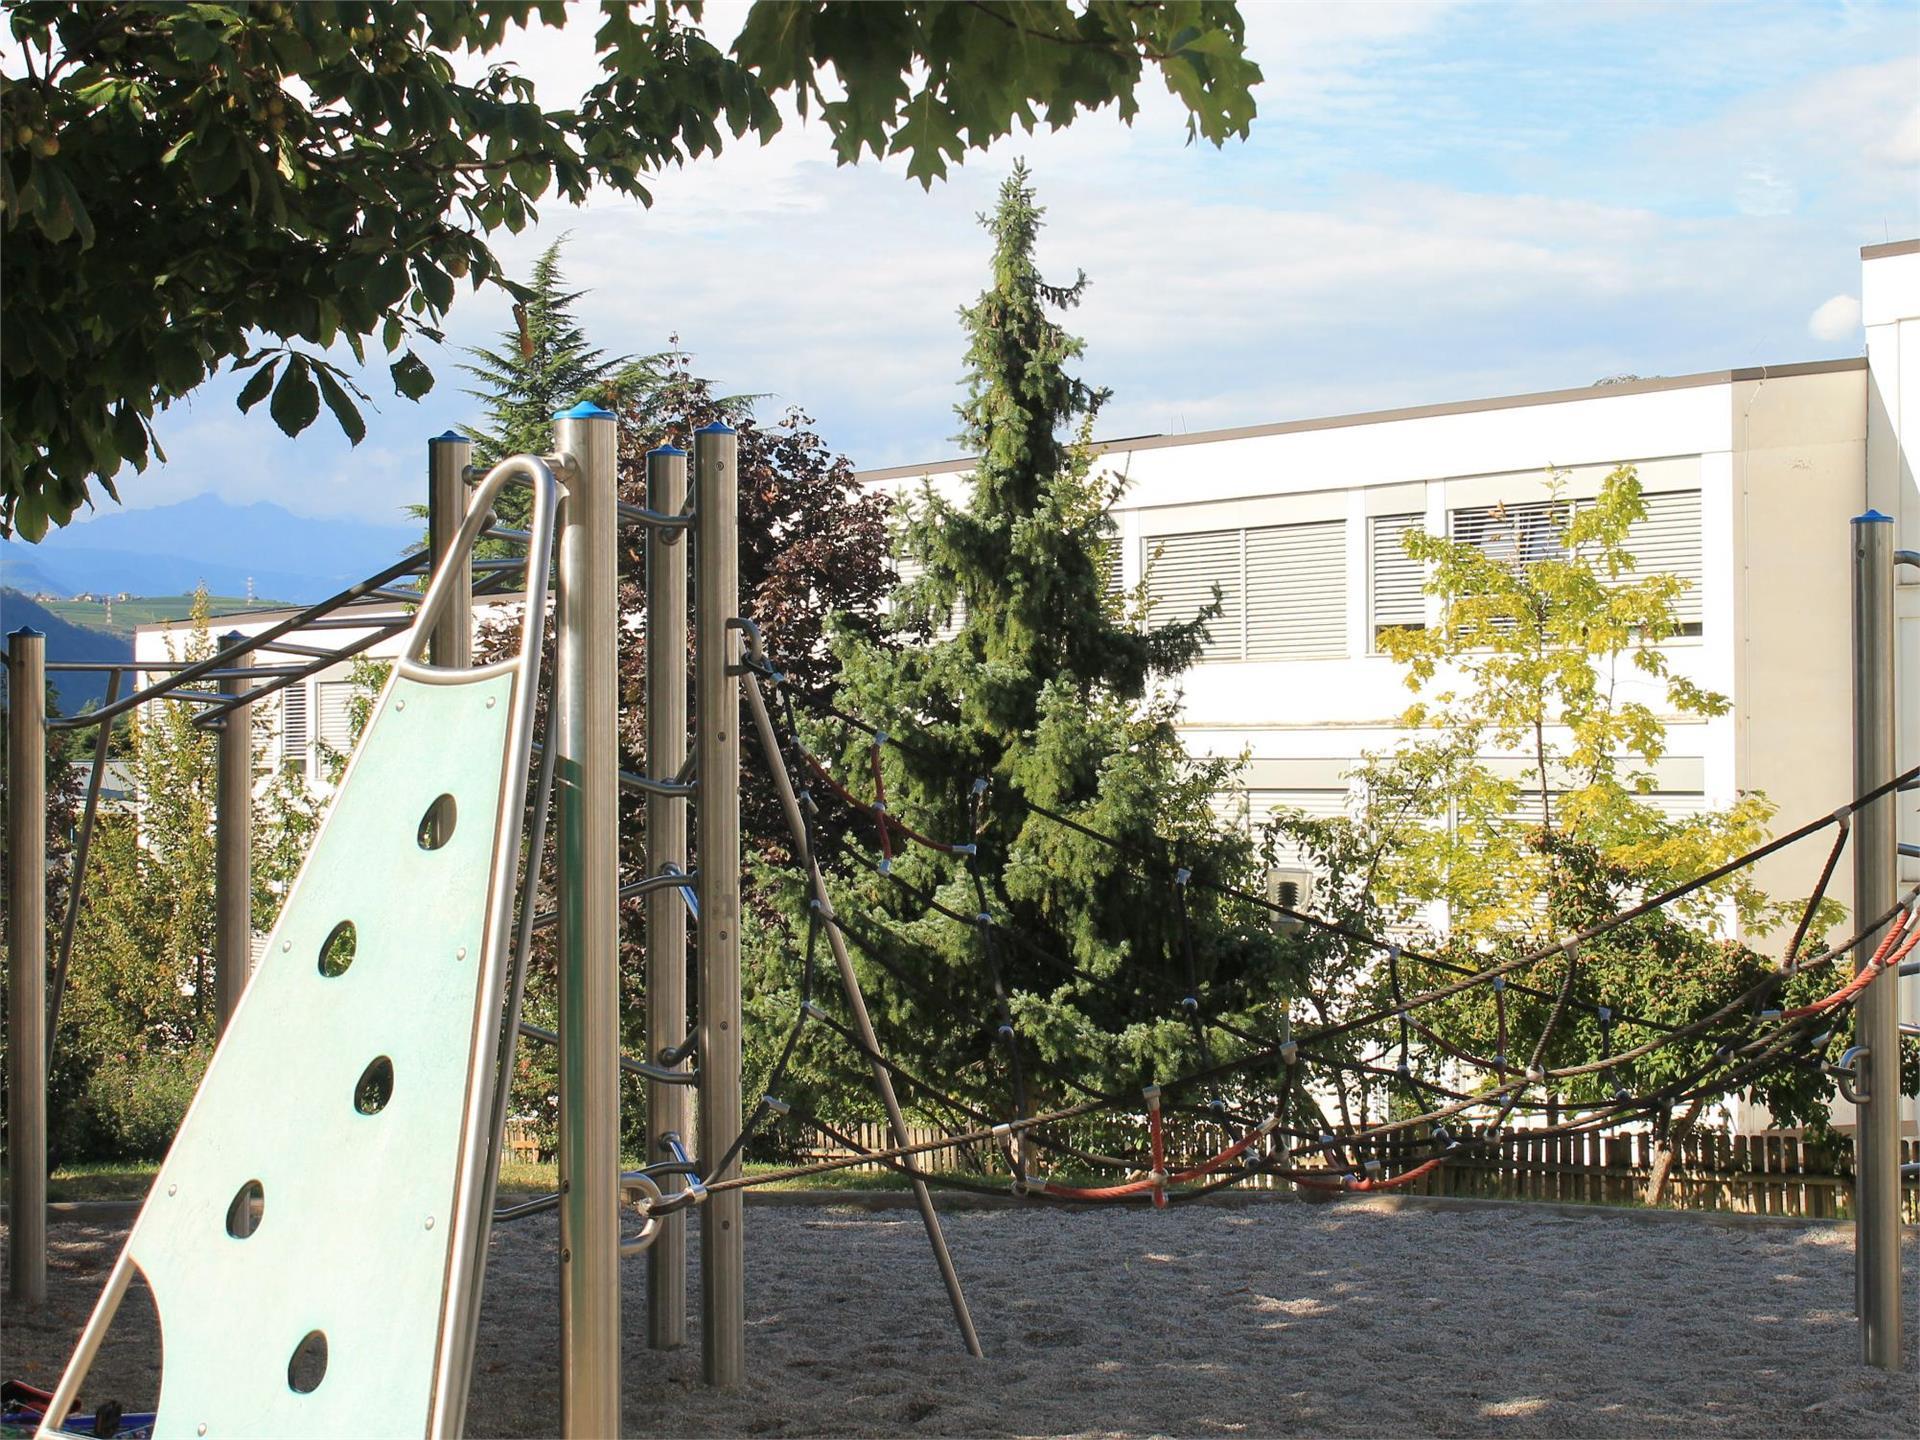 Playground Nazario Sauro